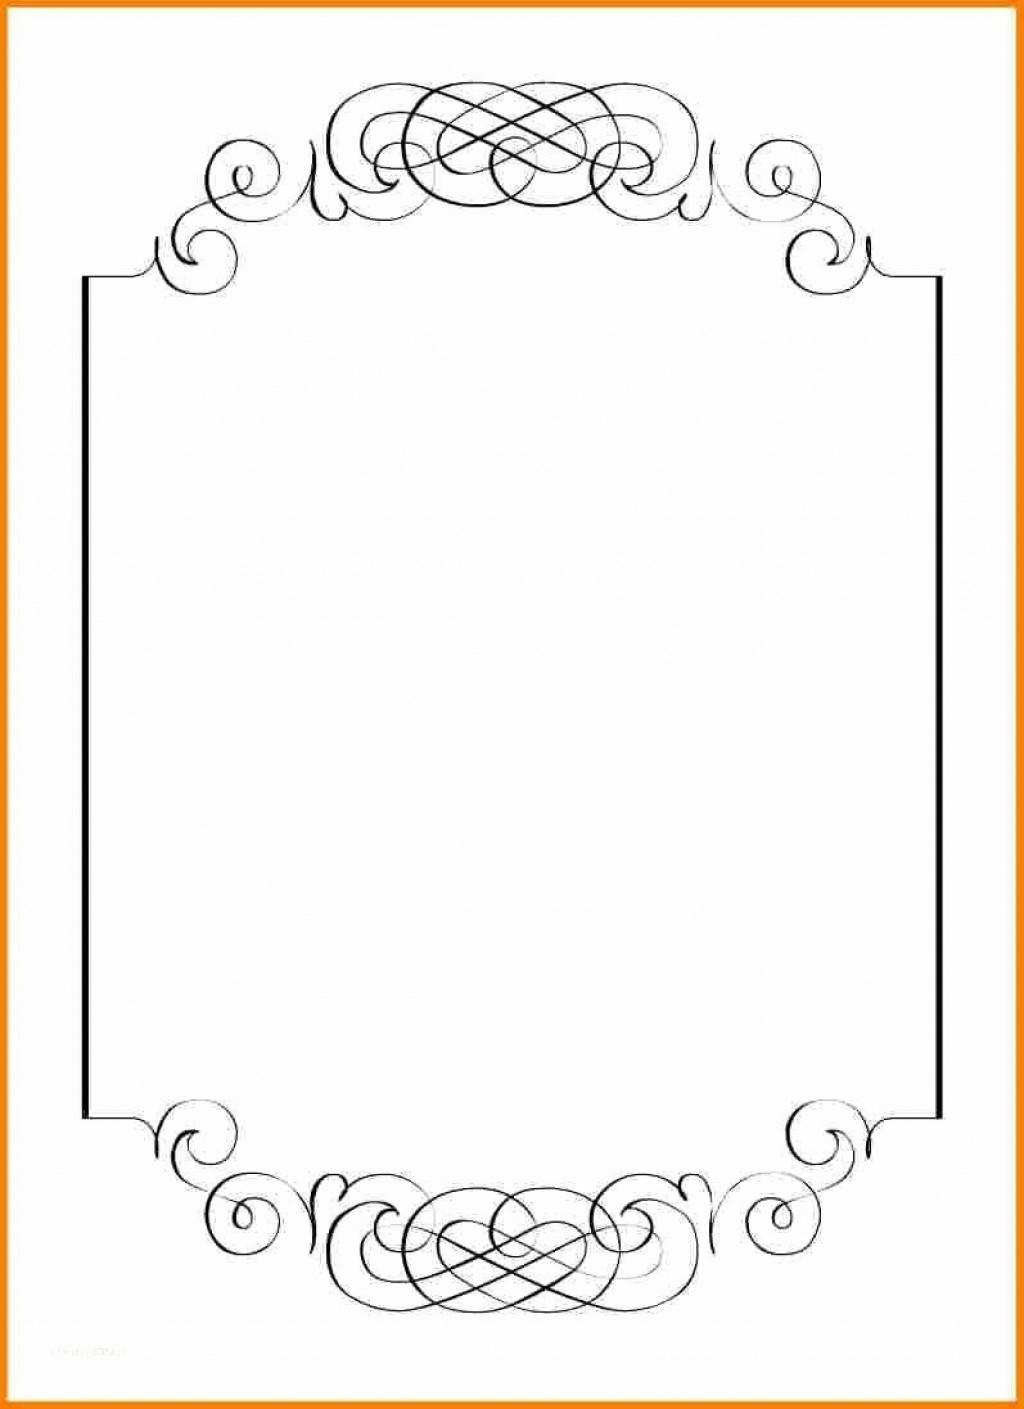 005 Singular Free Wedding Invitation Template For Word 2019 Image Large